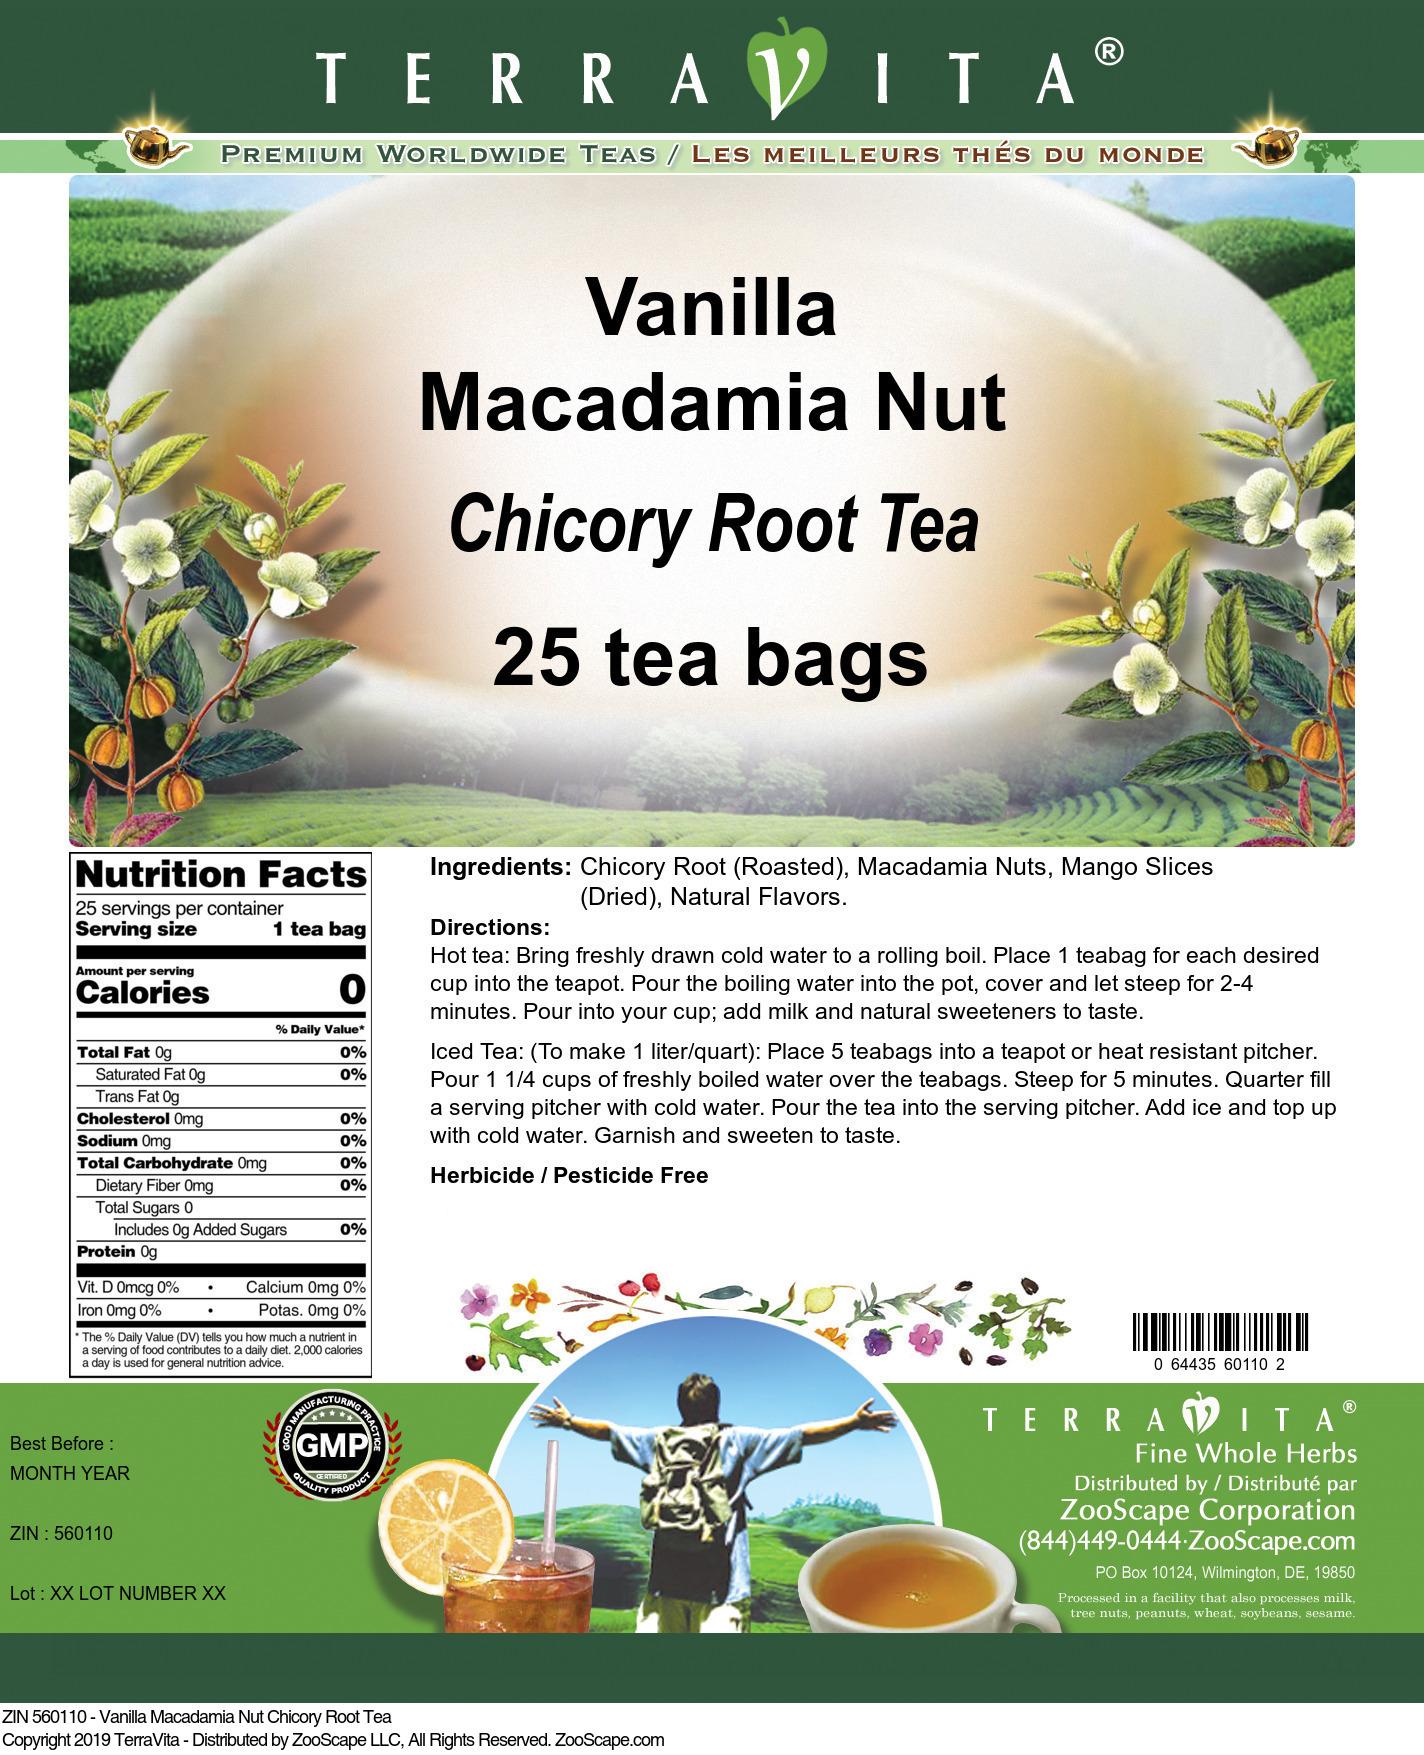 Vanilla Macadamia Nut Chicory Root